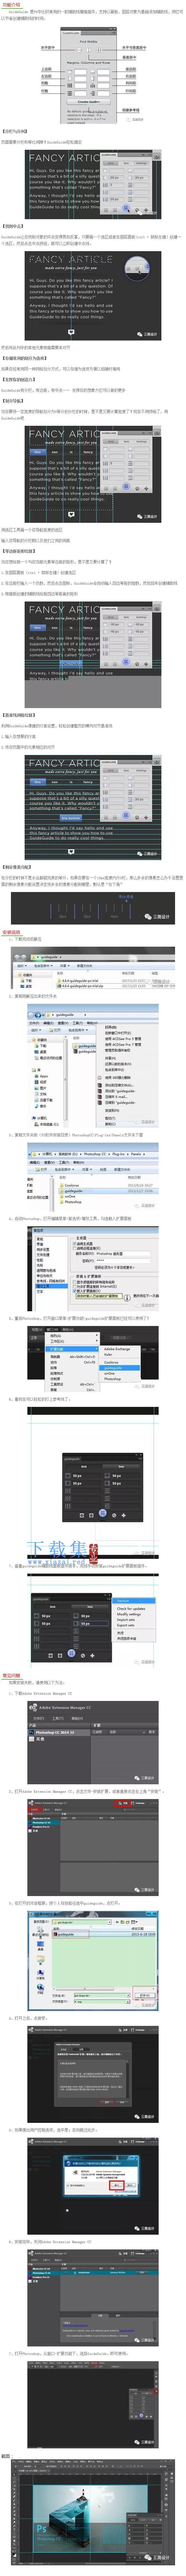 Guideguide(PS辅助线/参考线插件)v4.6.4丨亲测可用